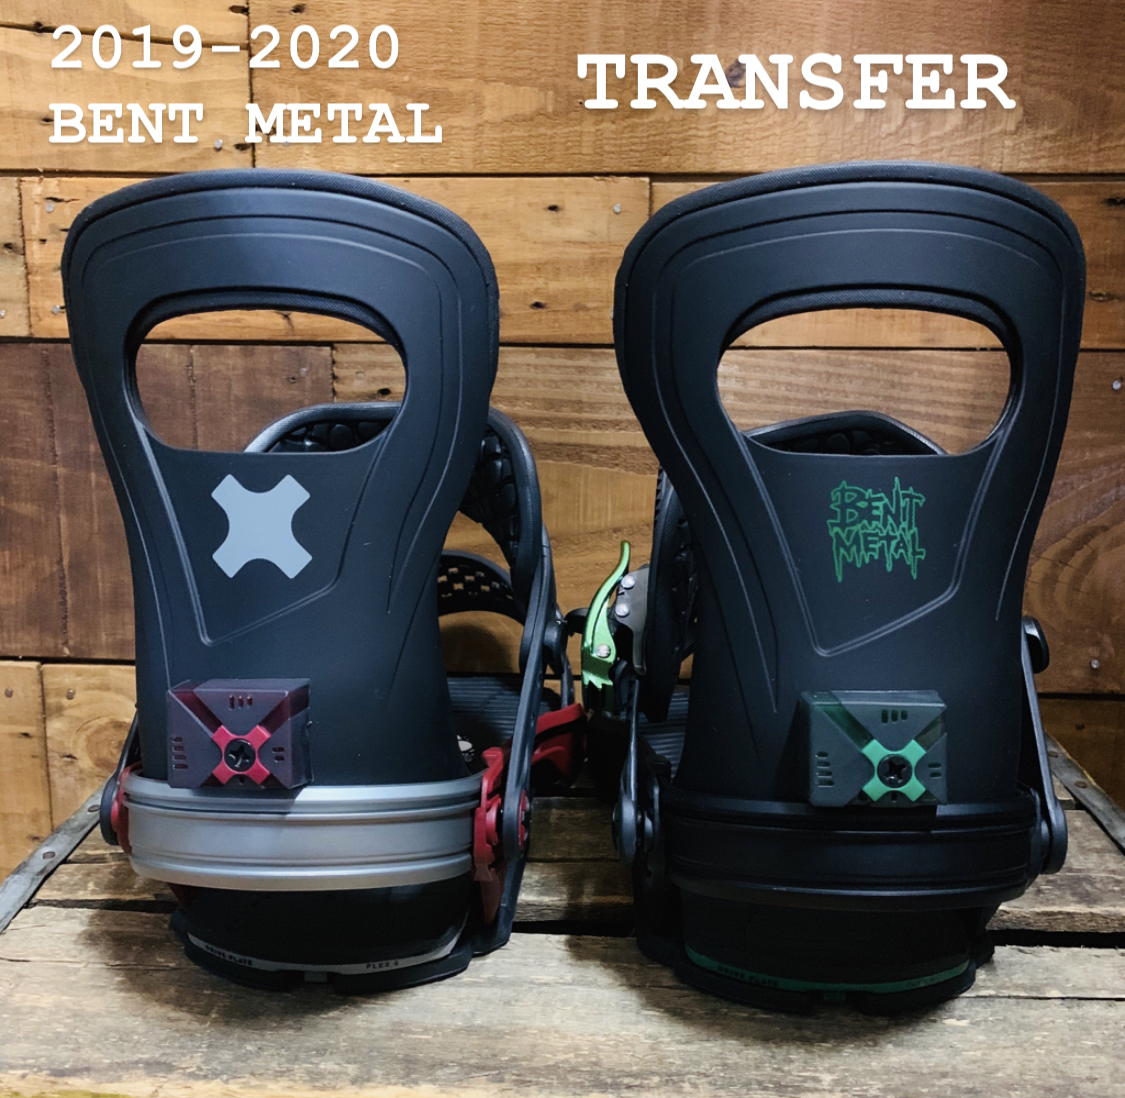 BENT METAL _商品01_ビンディング_TRANSFER